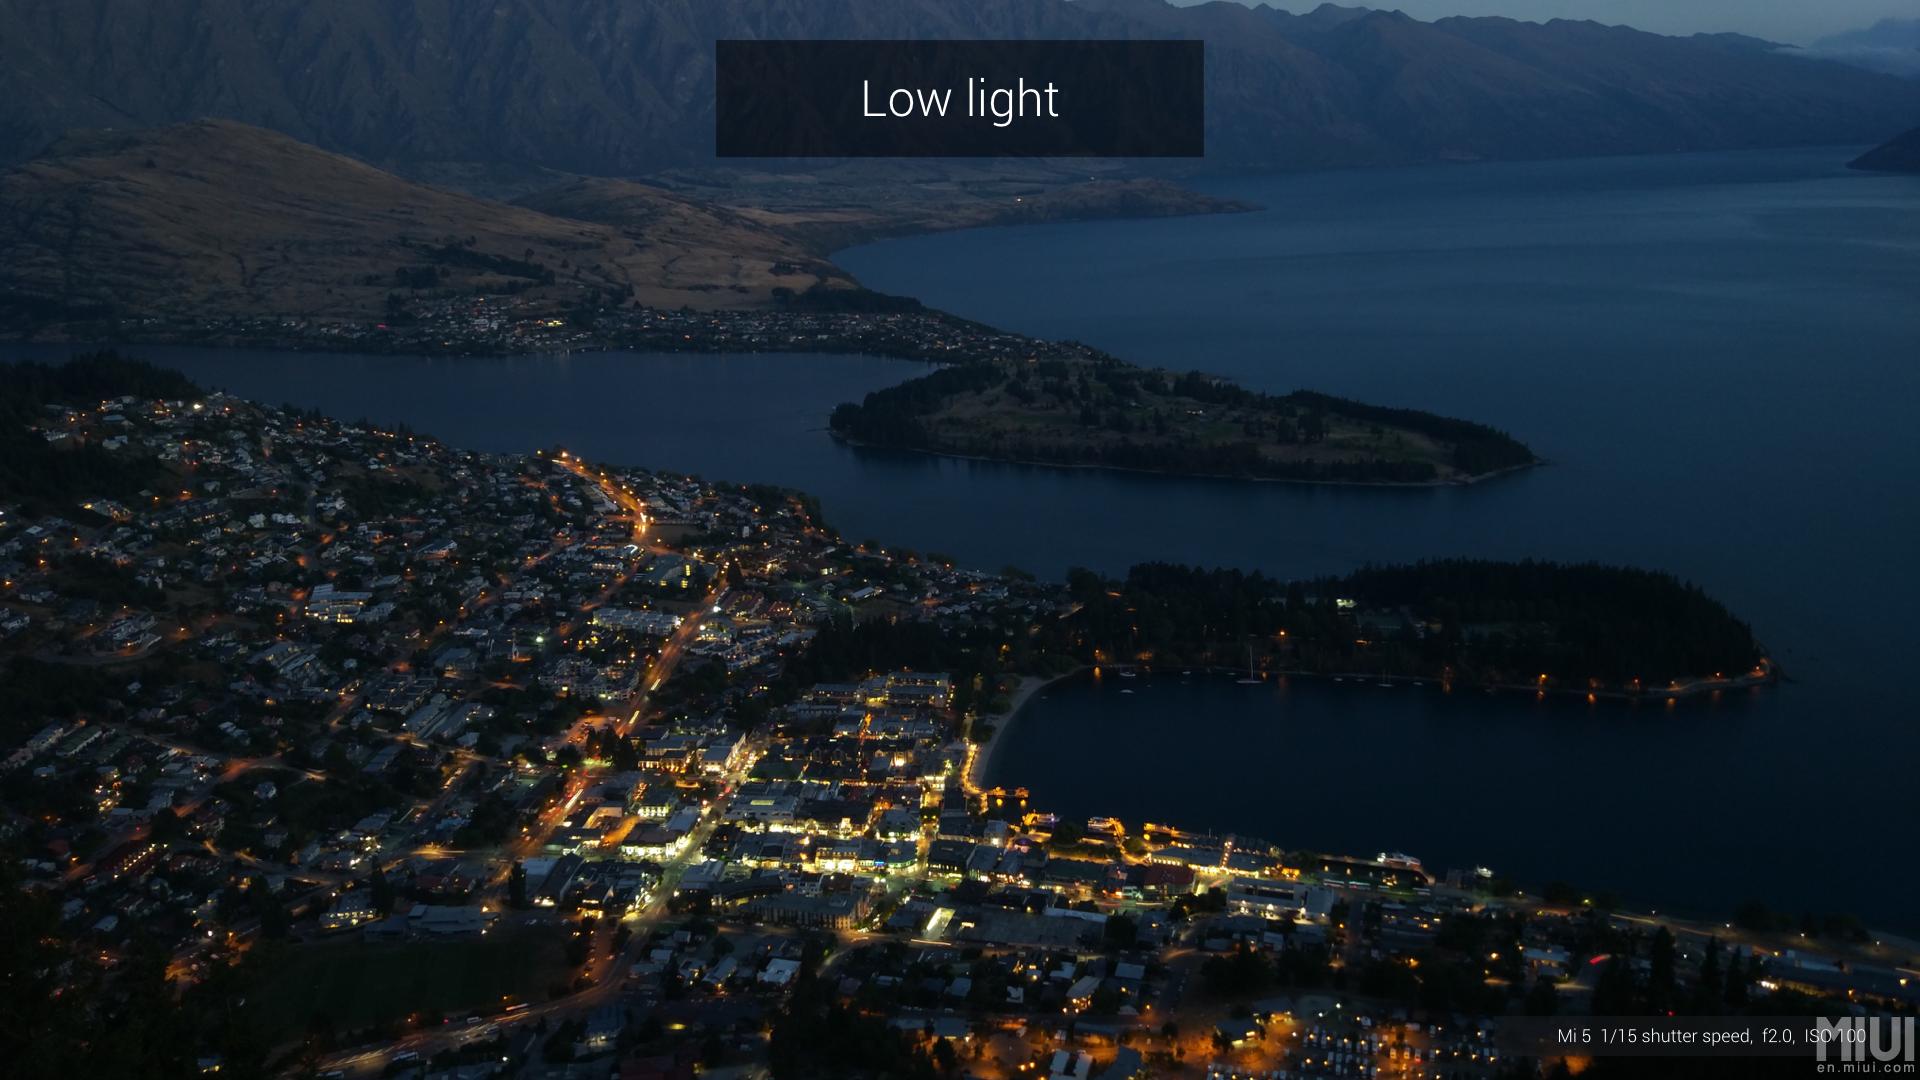 Hasil Foto Mi 5 low-light (c) Xiaomi - Generasi Muda